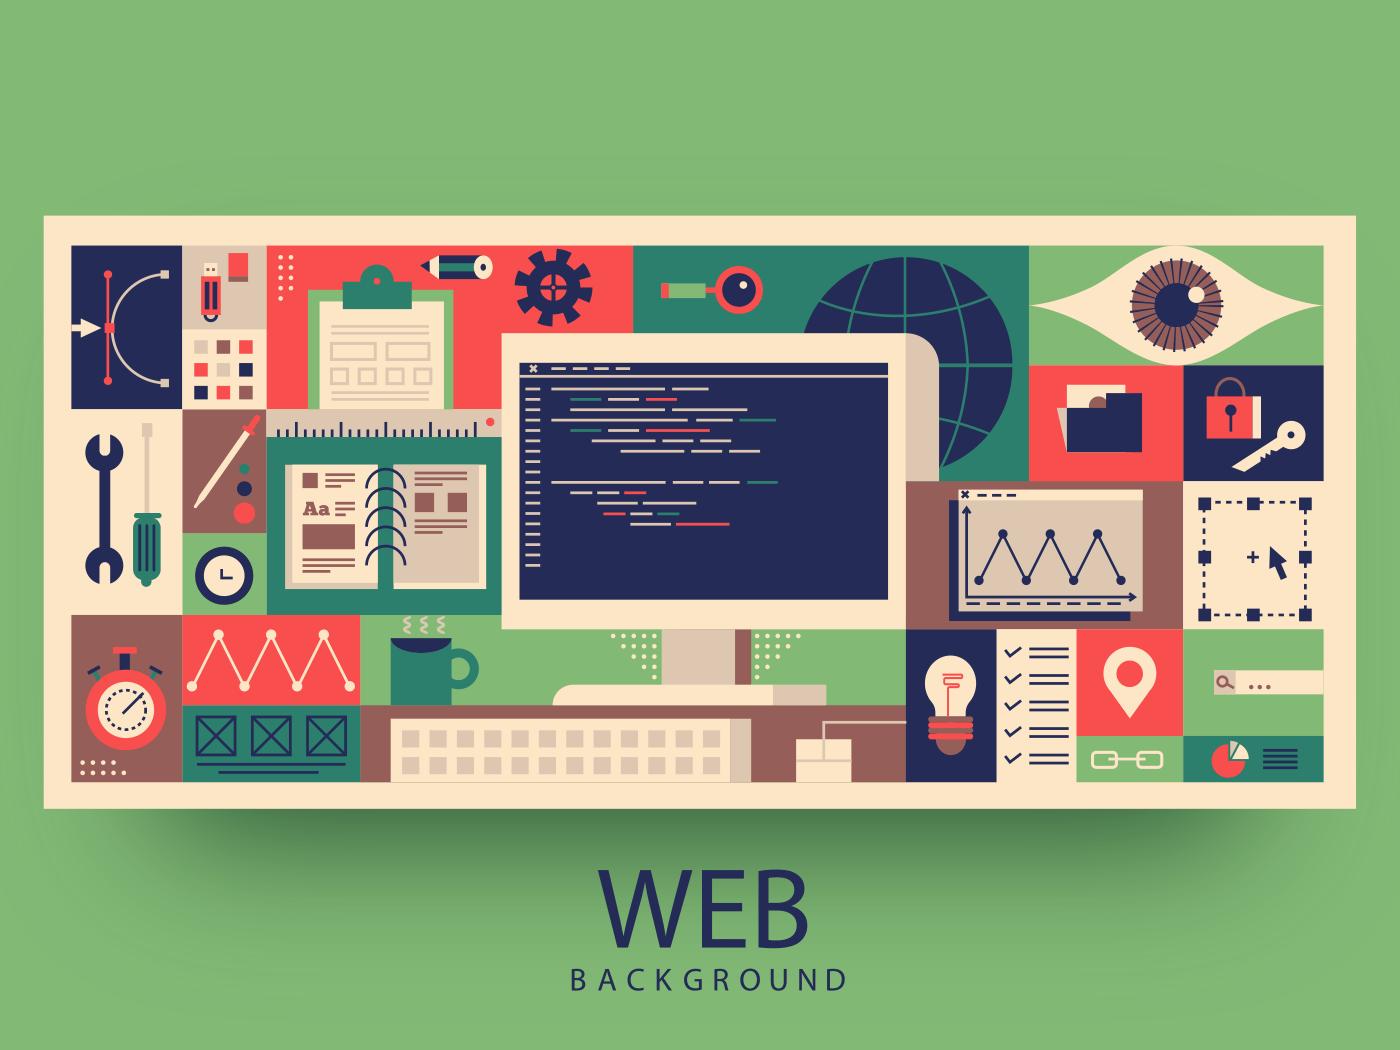 Web programming background vector illustration